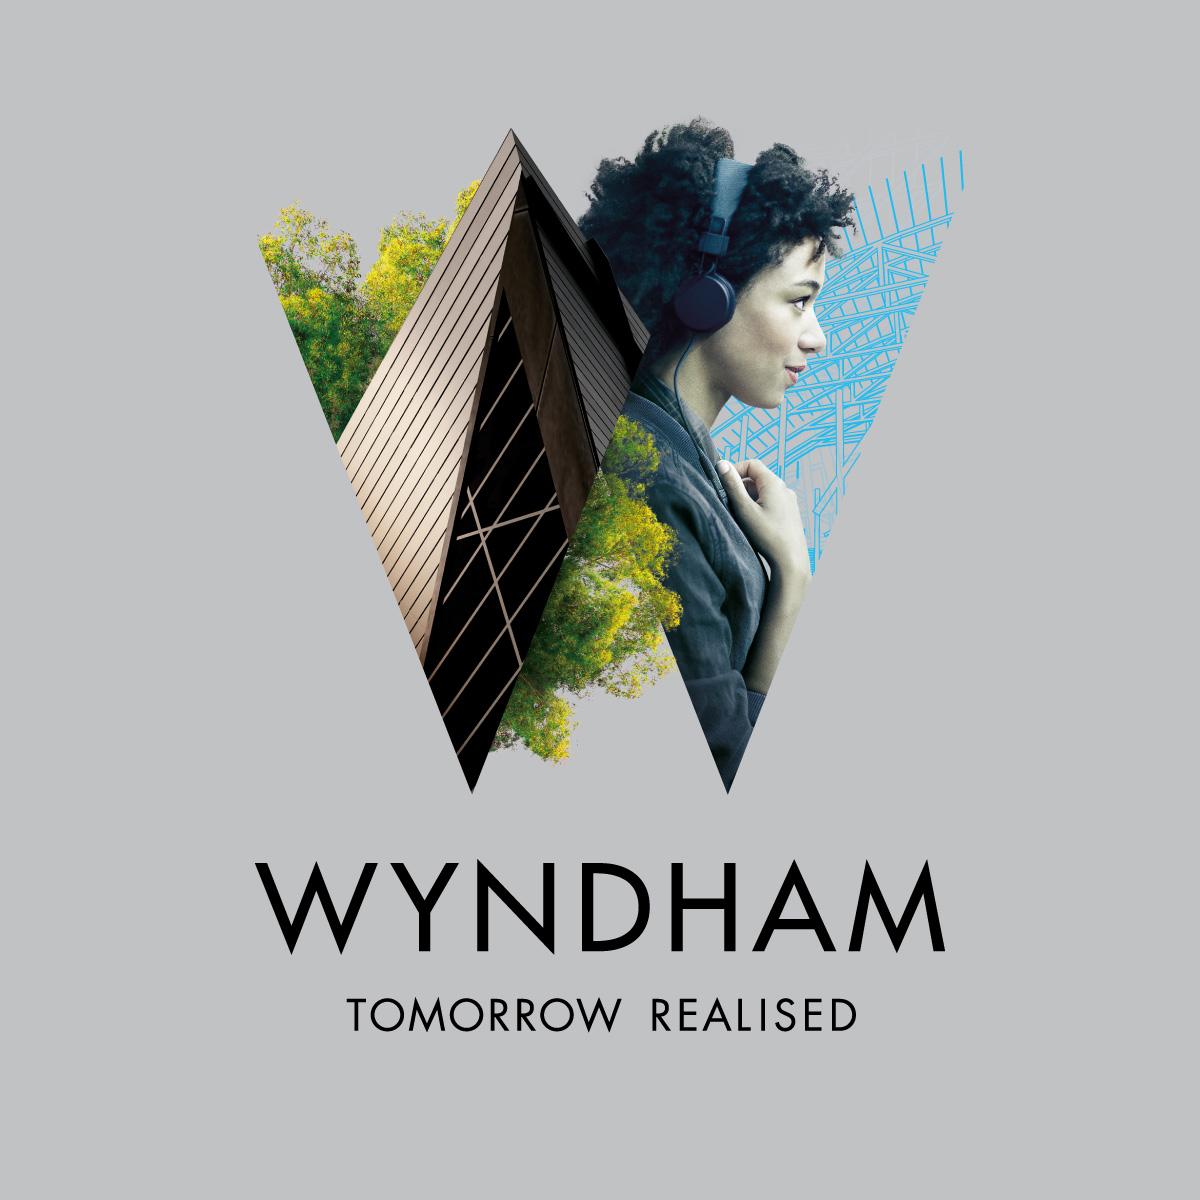 Wyndham Tomorrow Realised Brand Identity and Strategy